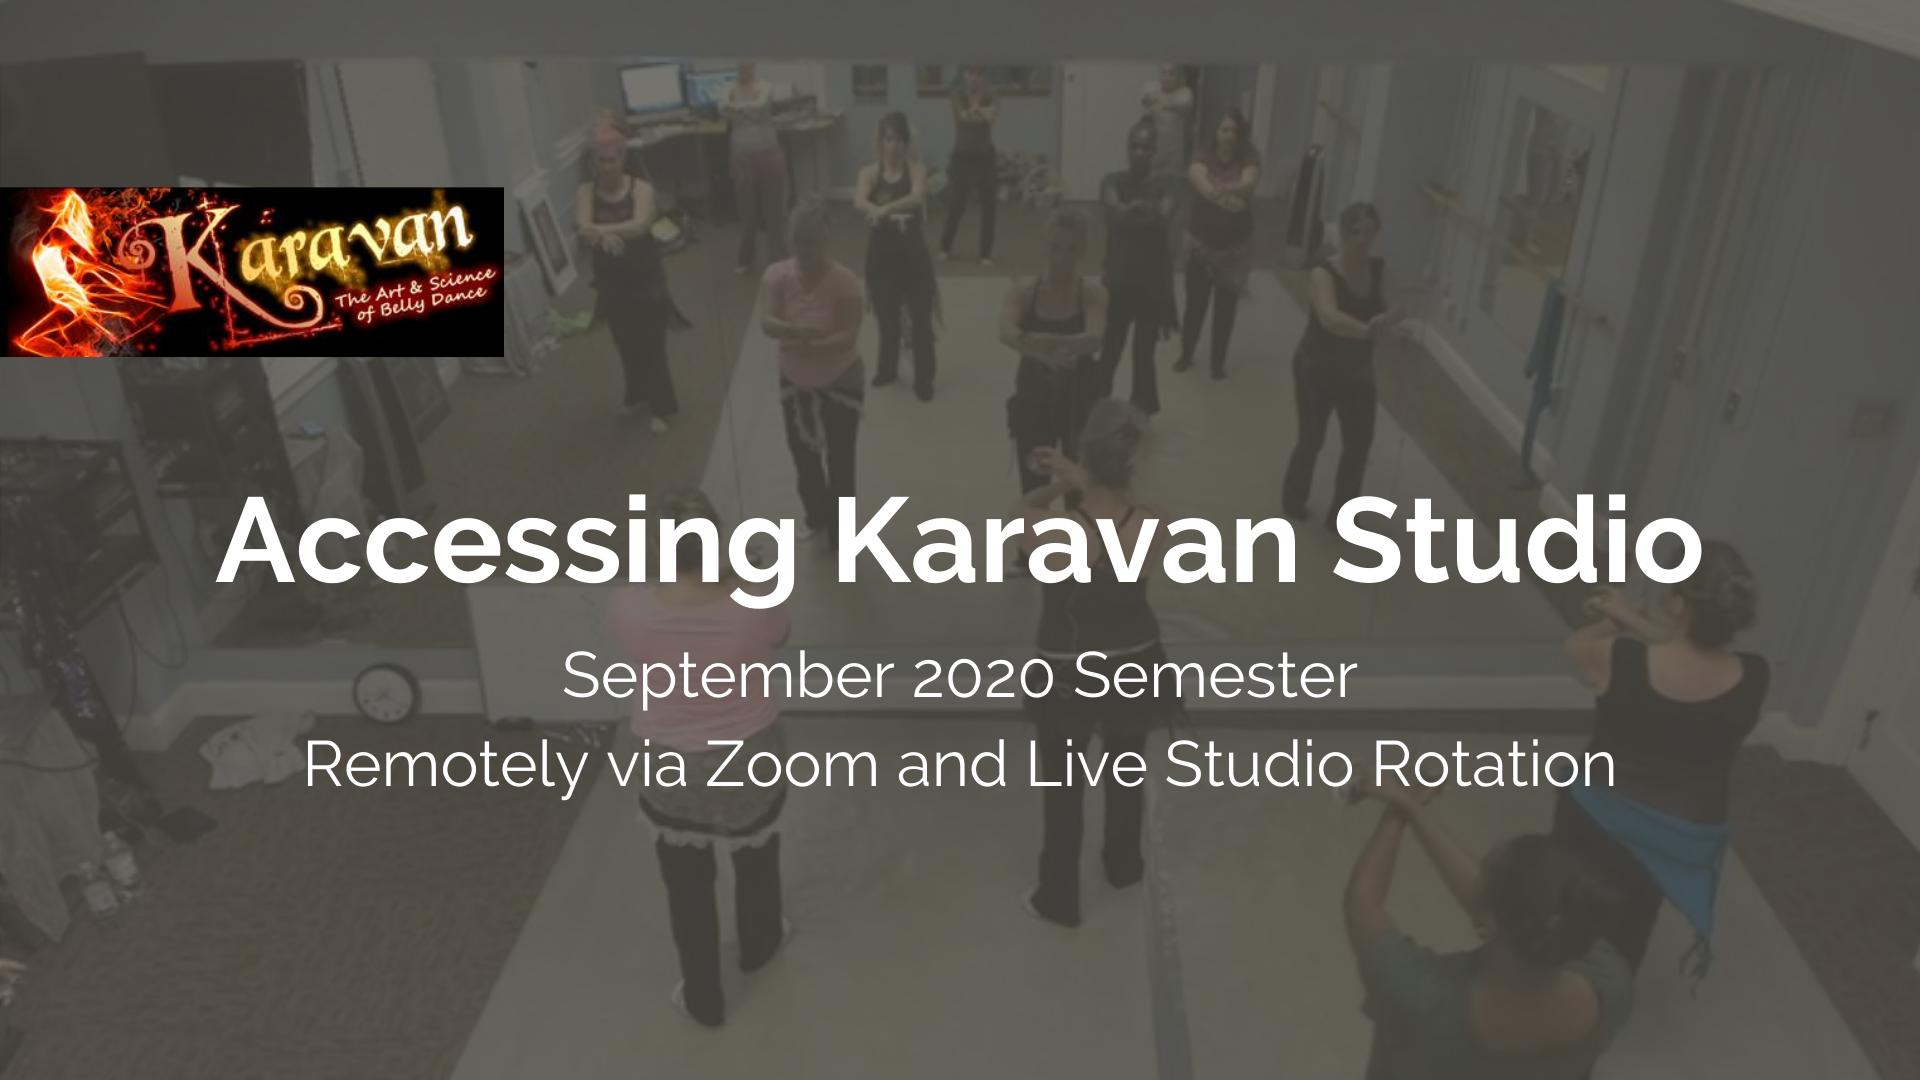 Accessing Karavan Studio